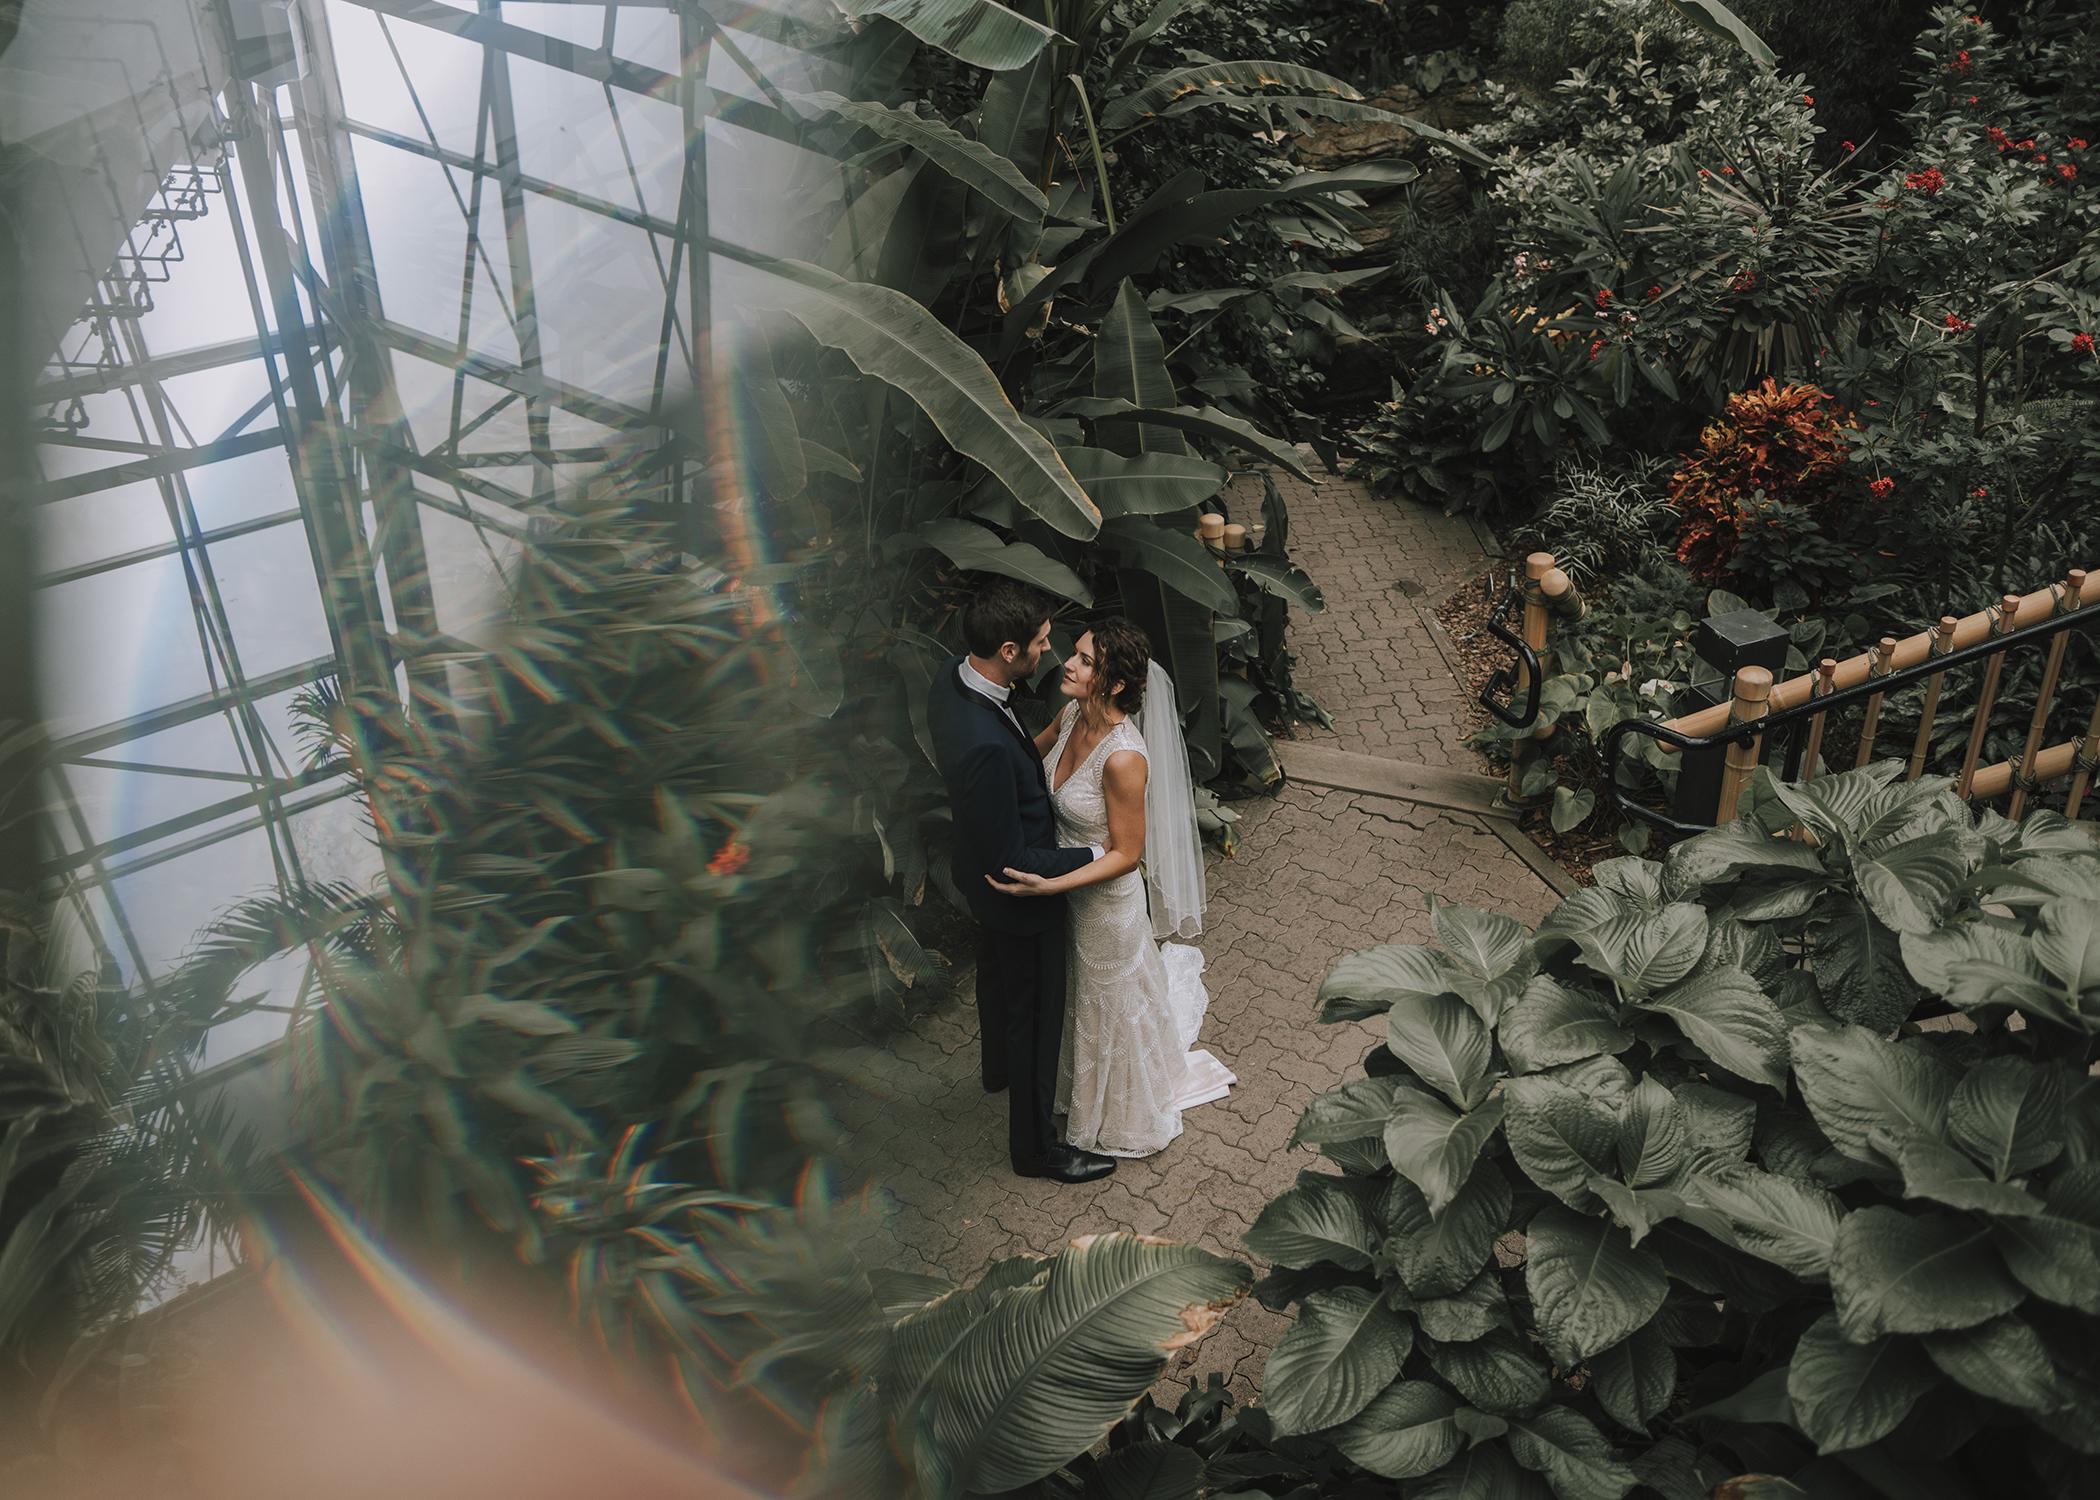 Foellinger-Freimann Botanical Conservatory indianapolis indiana hannah bergman Photography prism bridal portraits